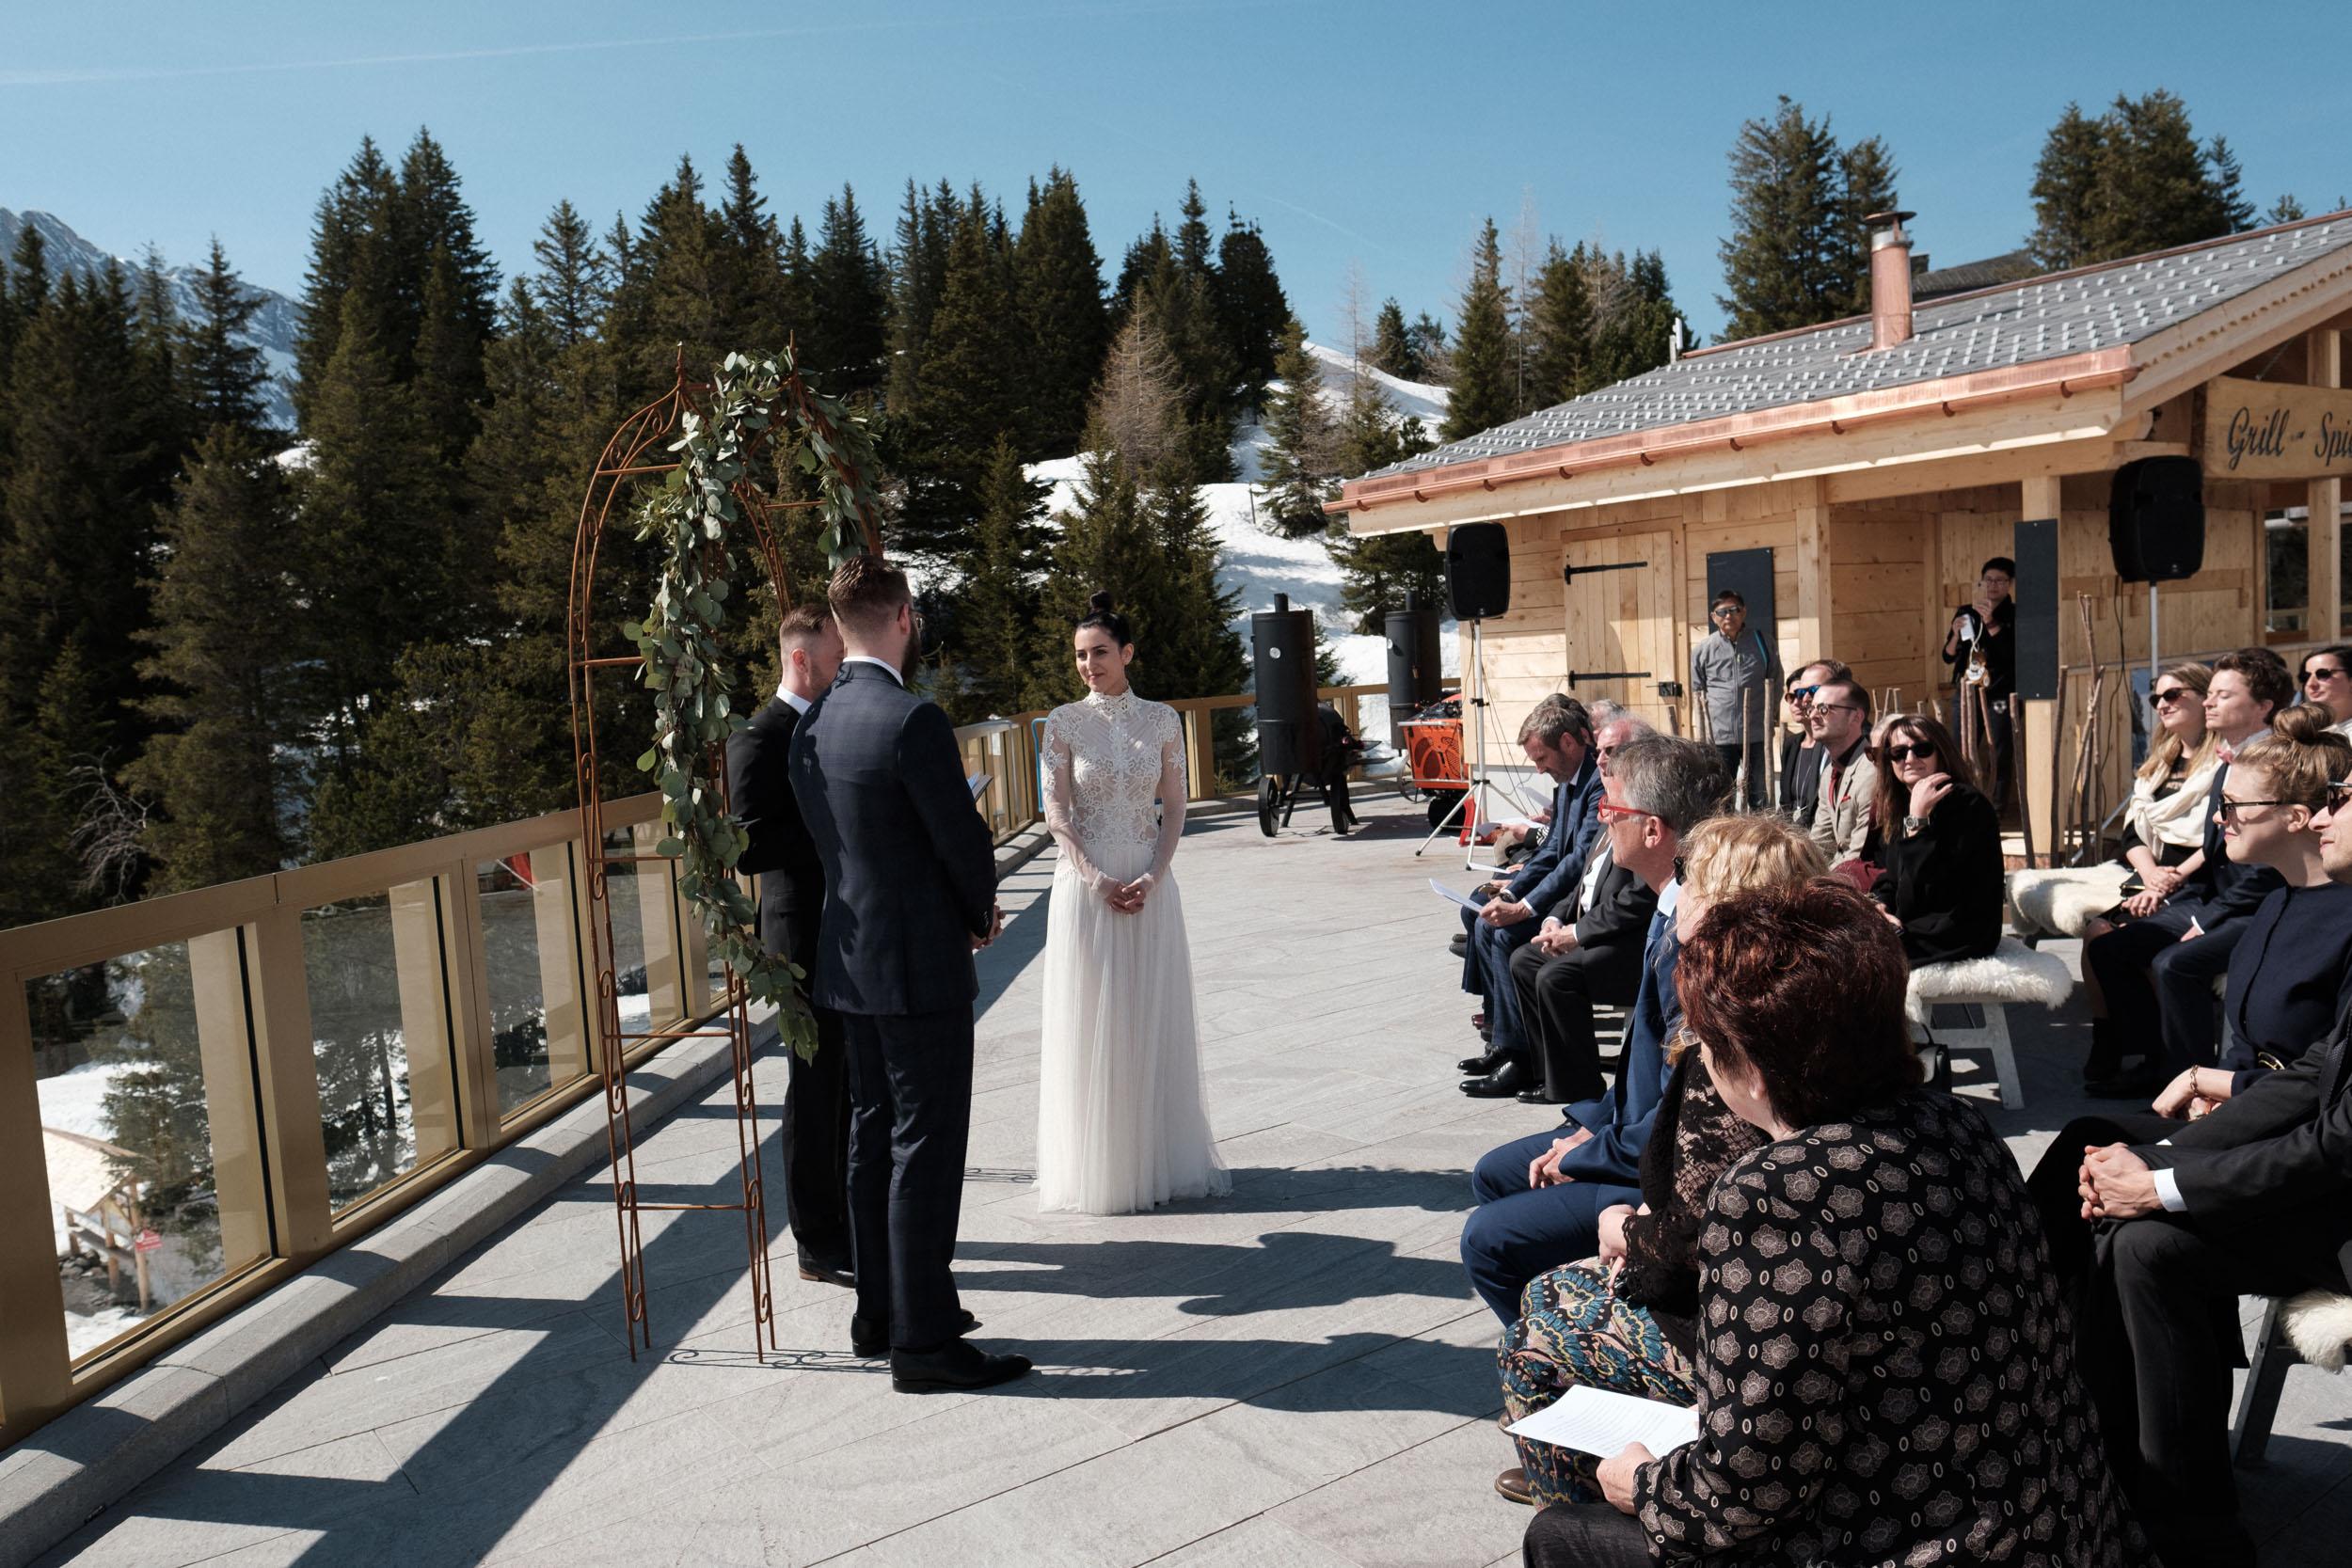 lynn-bastian-switzerland-wedding-photography-60.jpg